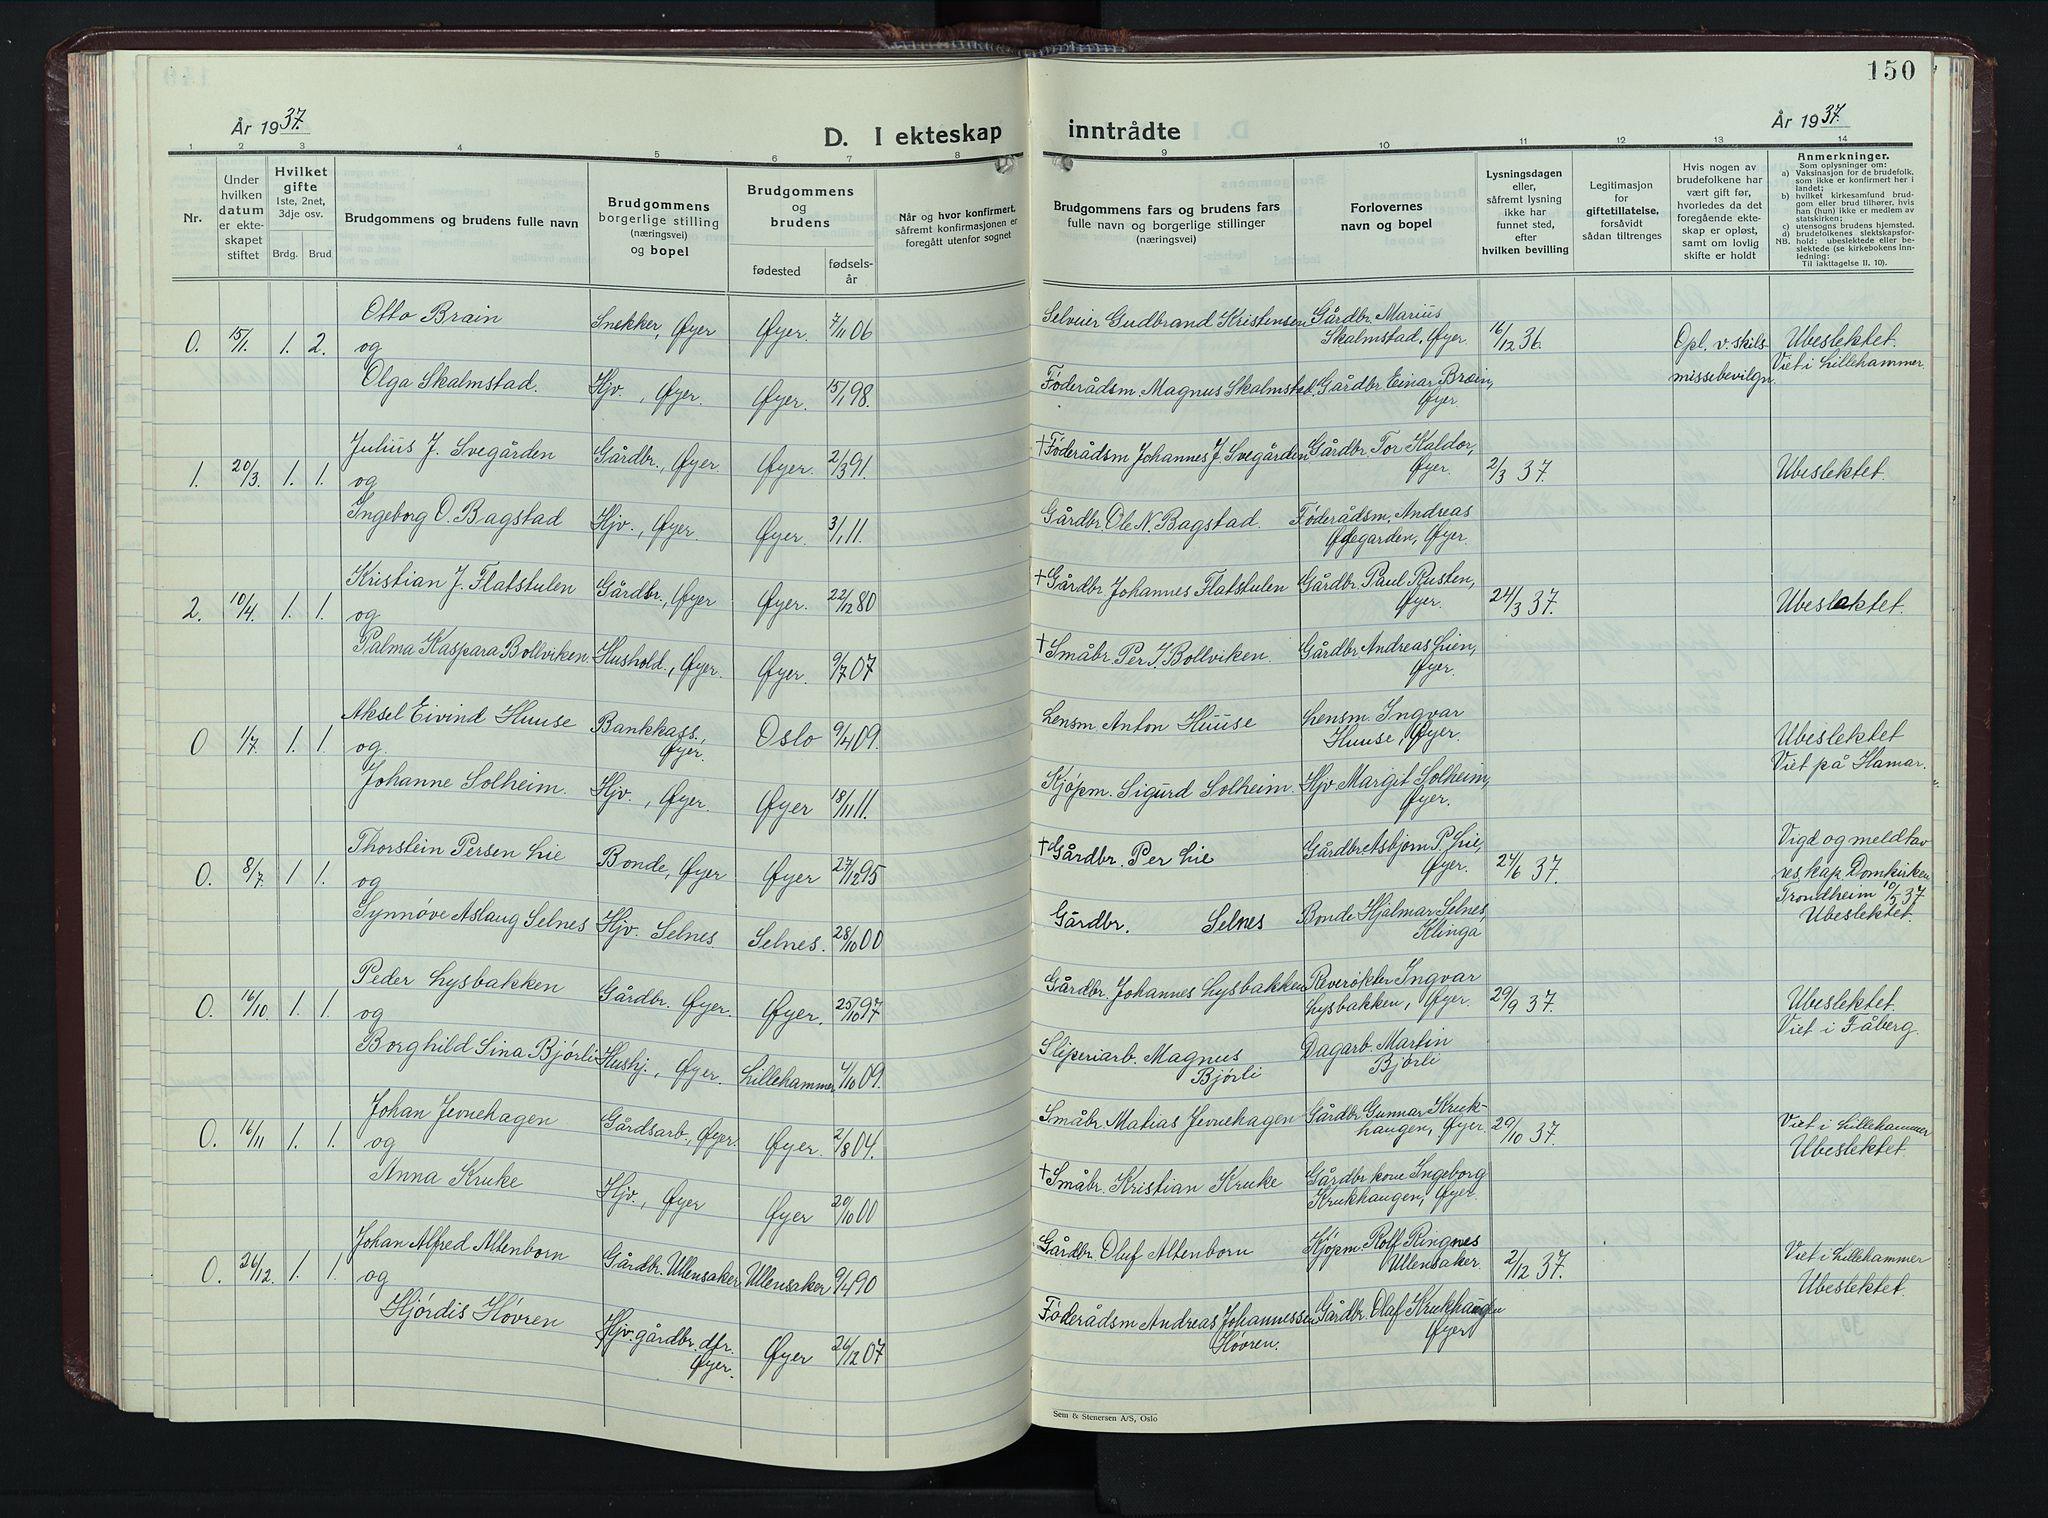 SAH, Øyer prestekontor, Klokkerbok nr. 8, 1929-1947, s. 150